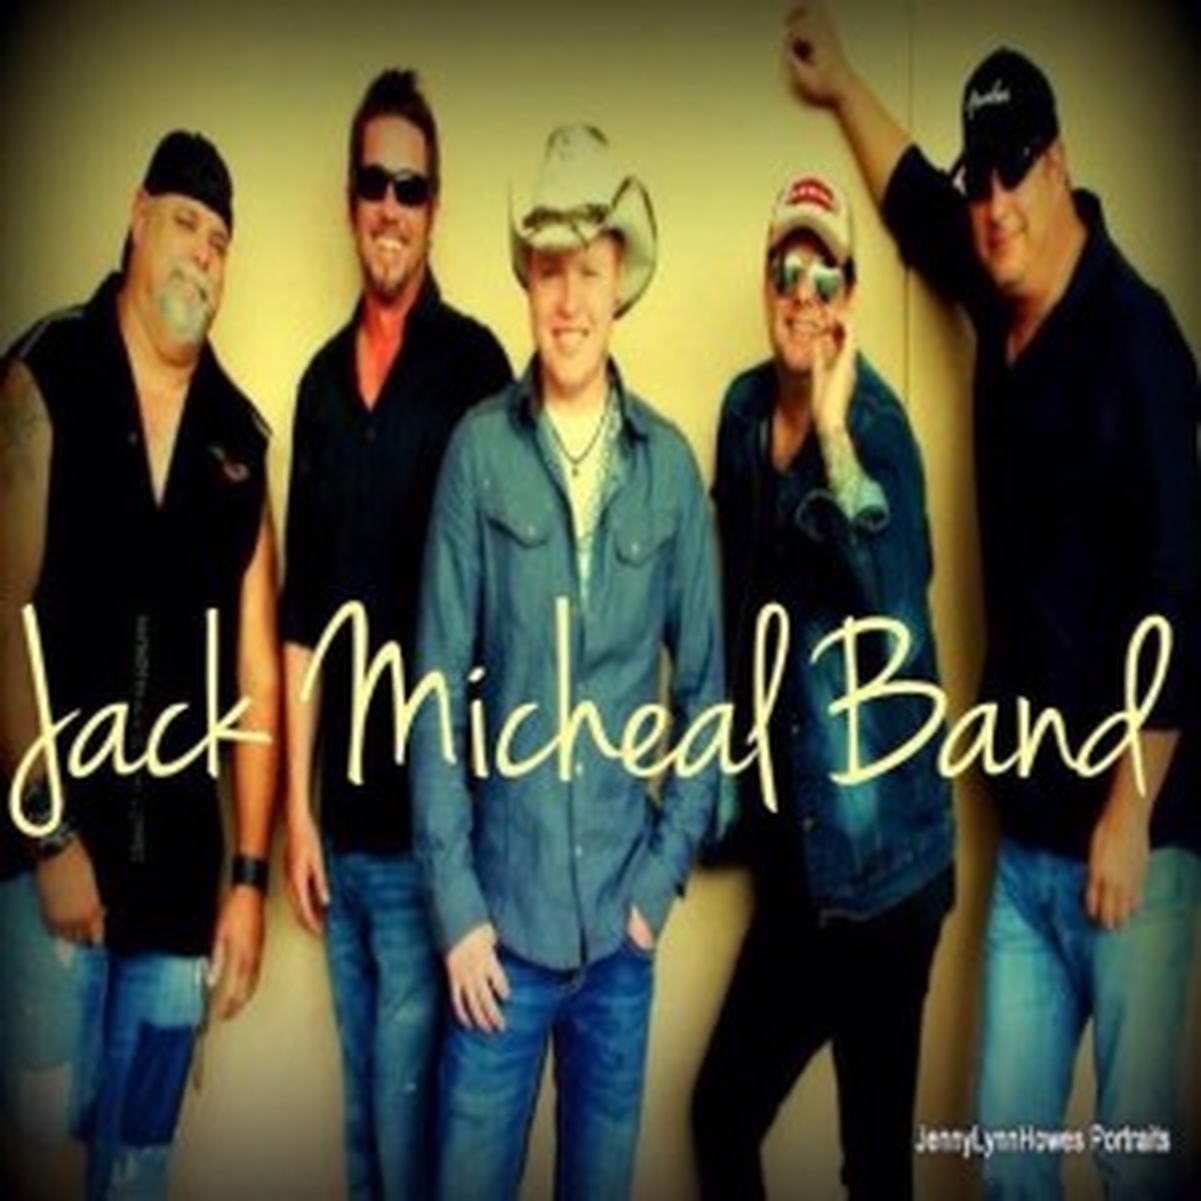 Jack Michael Band